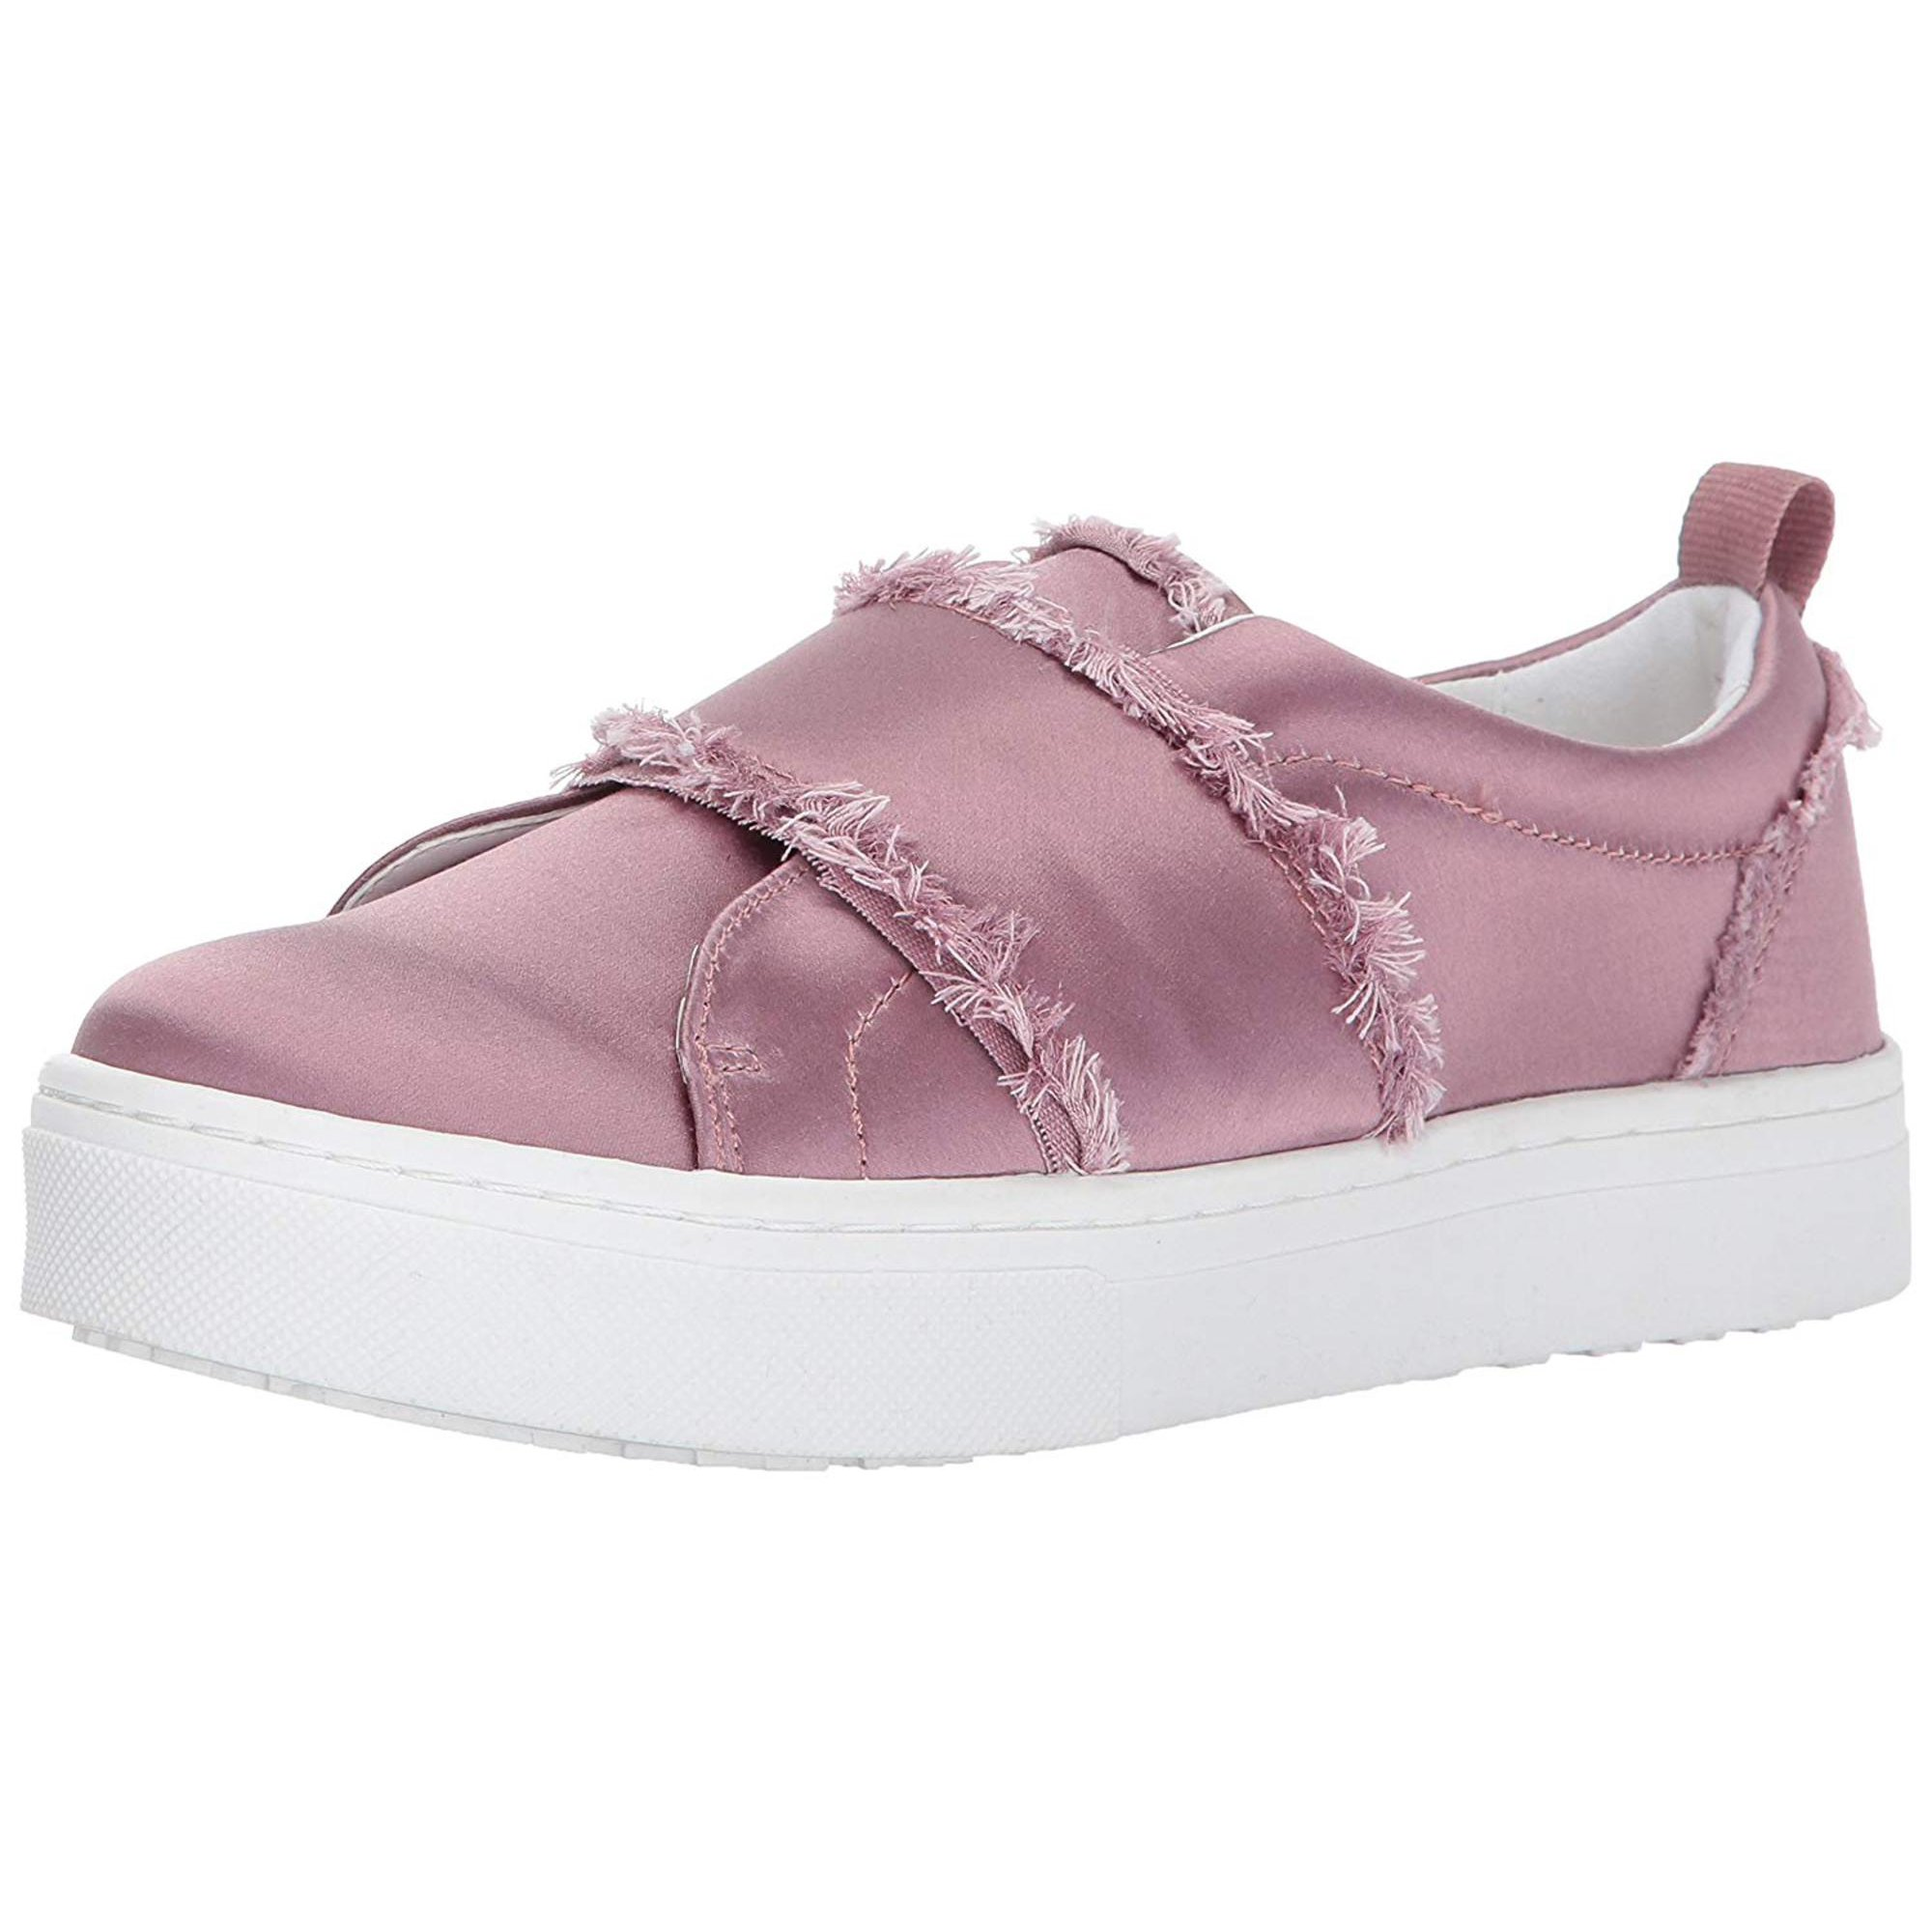 4b90db062a3e3 Sam Edelman Womens Levine Low Top Pull On Fashion Sneakers